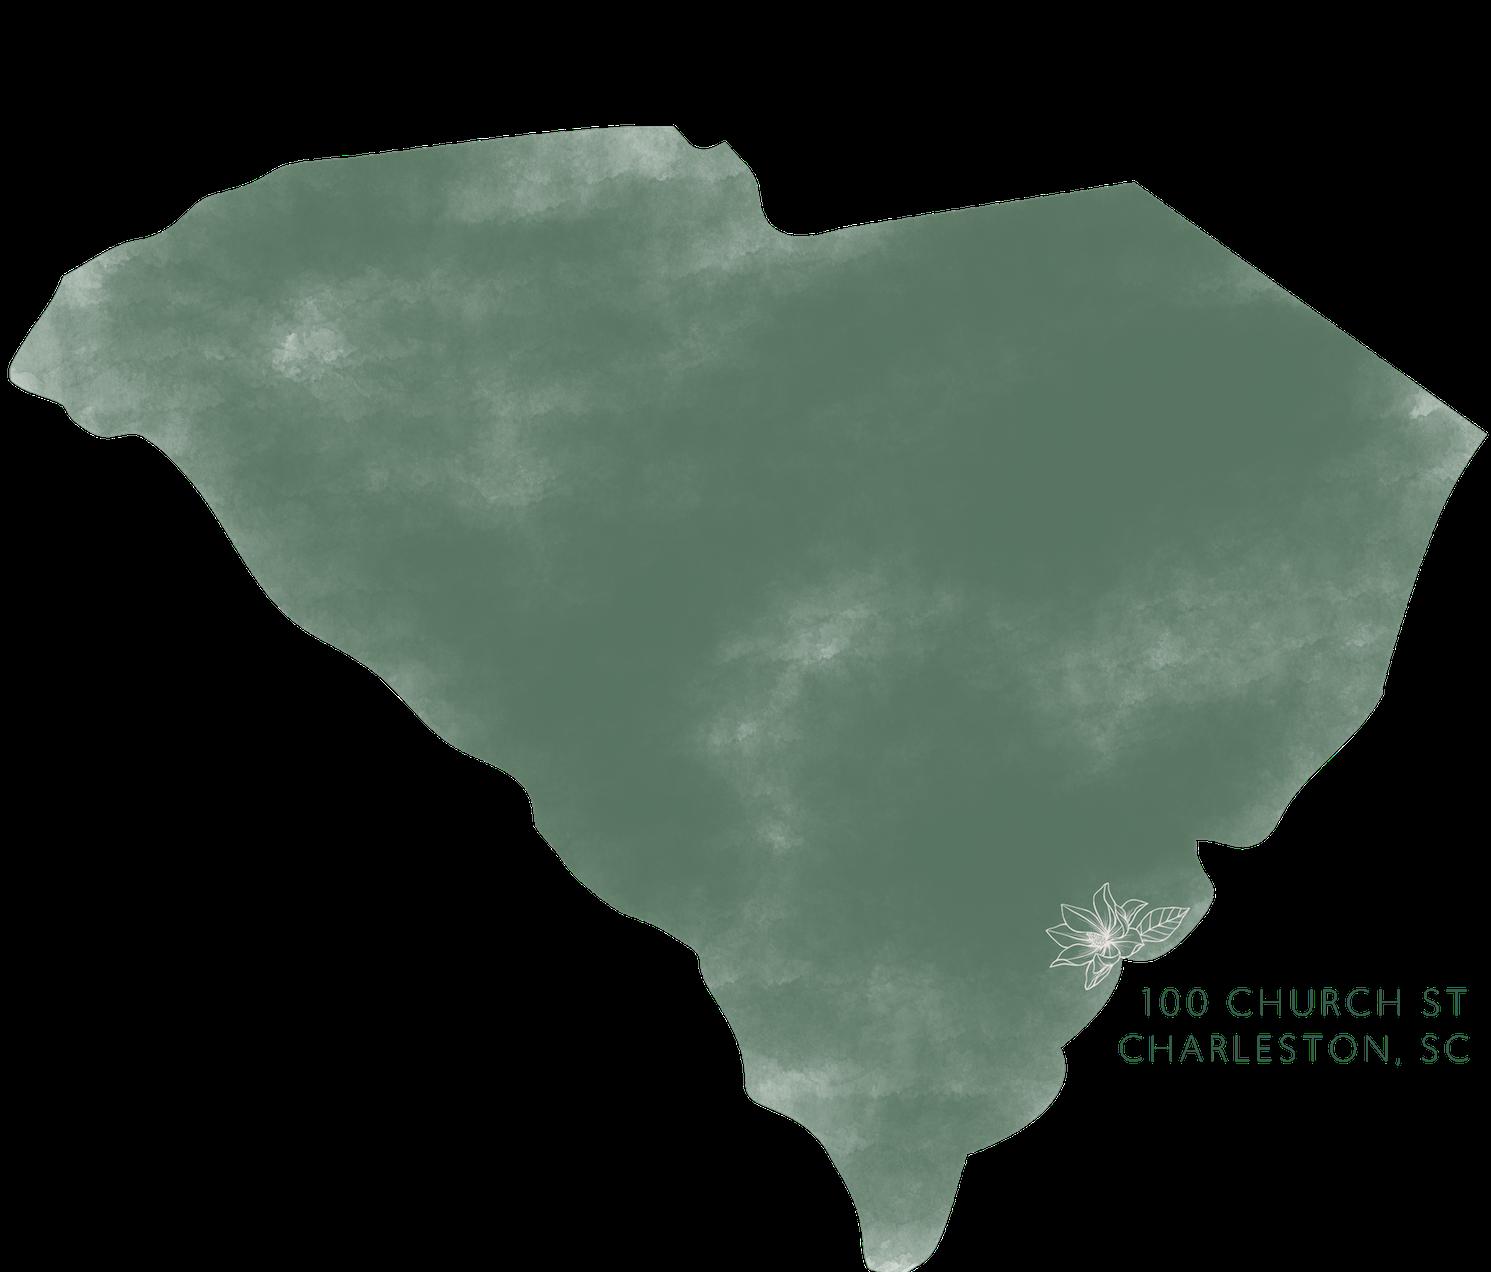 Charleston South Carolina location of Magnolia bride .png